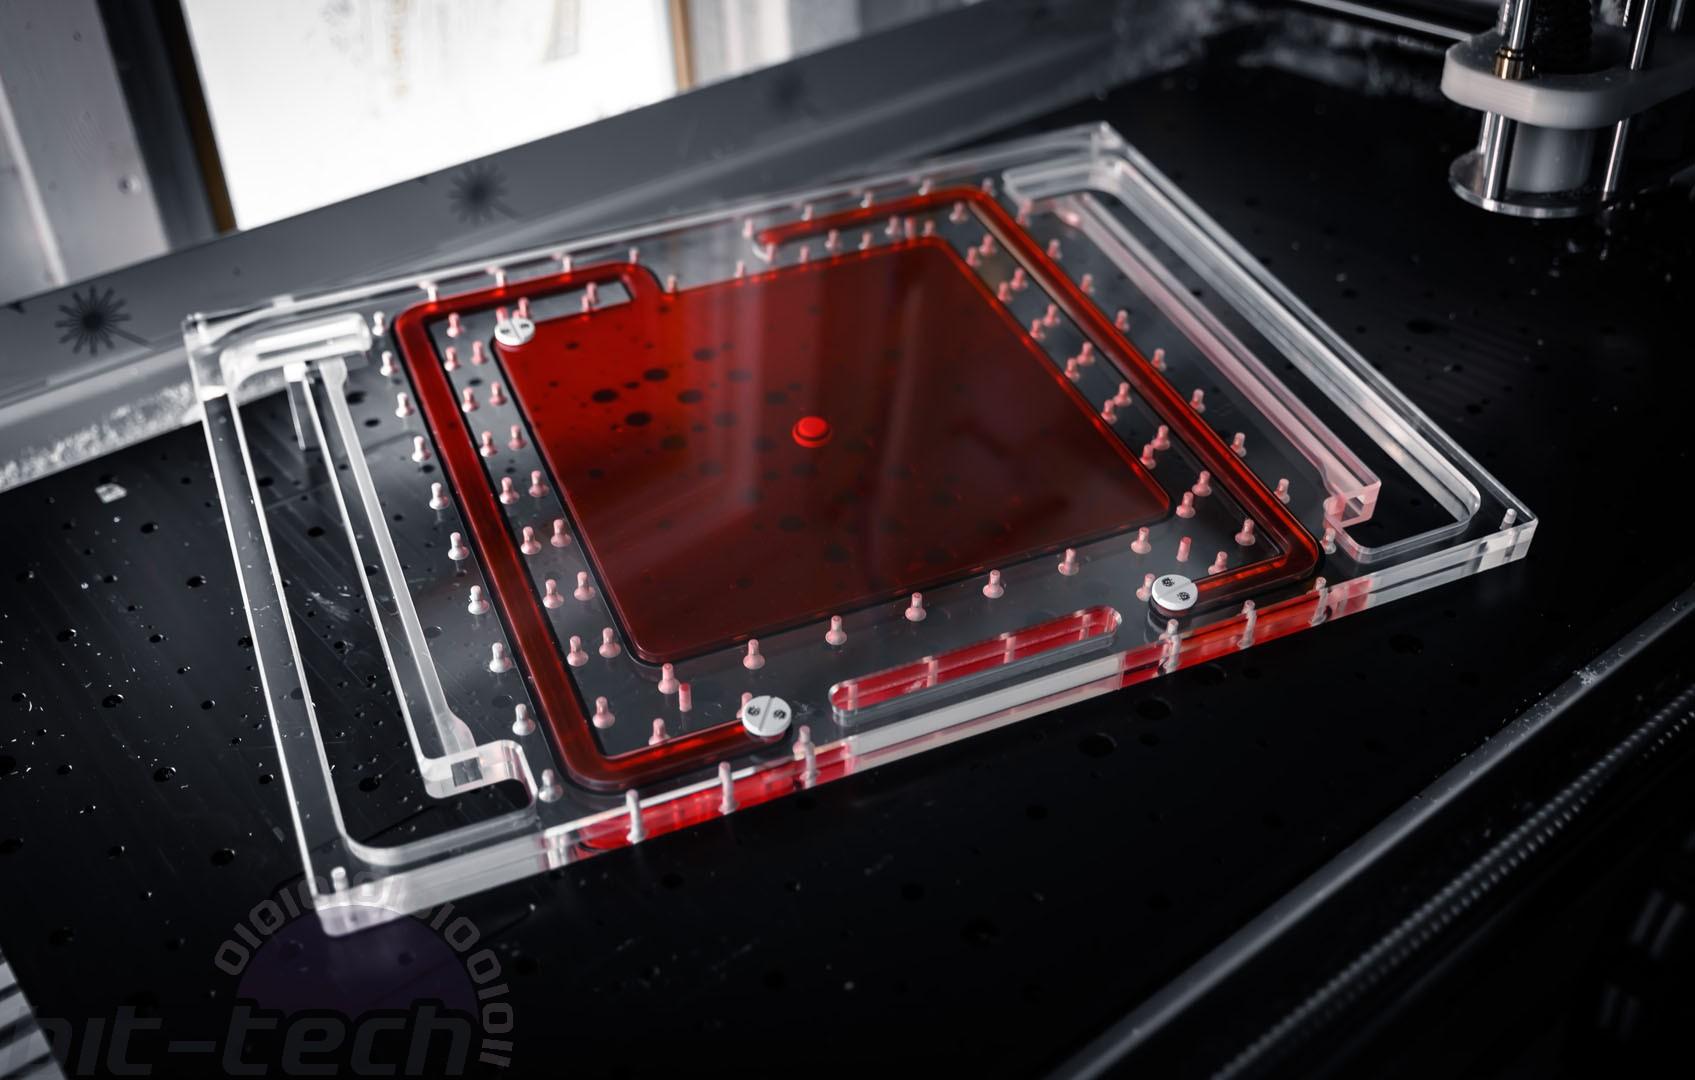 How To Machine a Distro Plate | bit-tech net